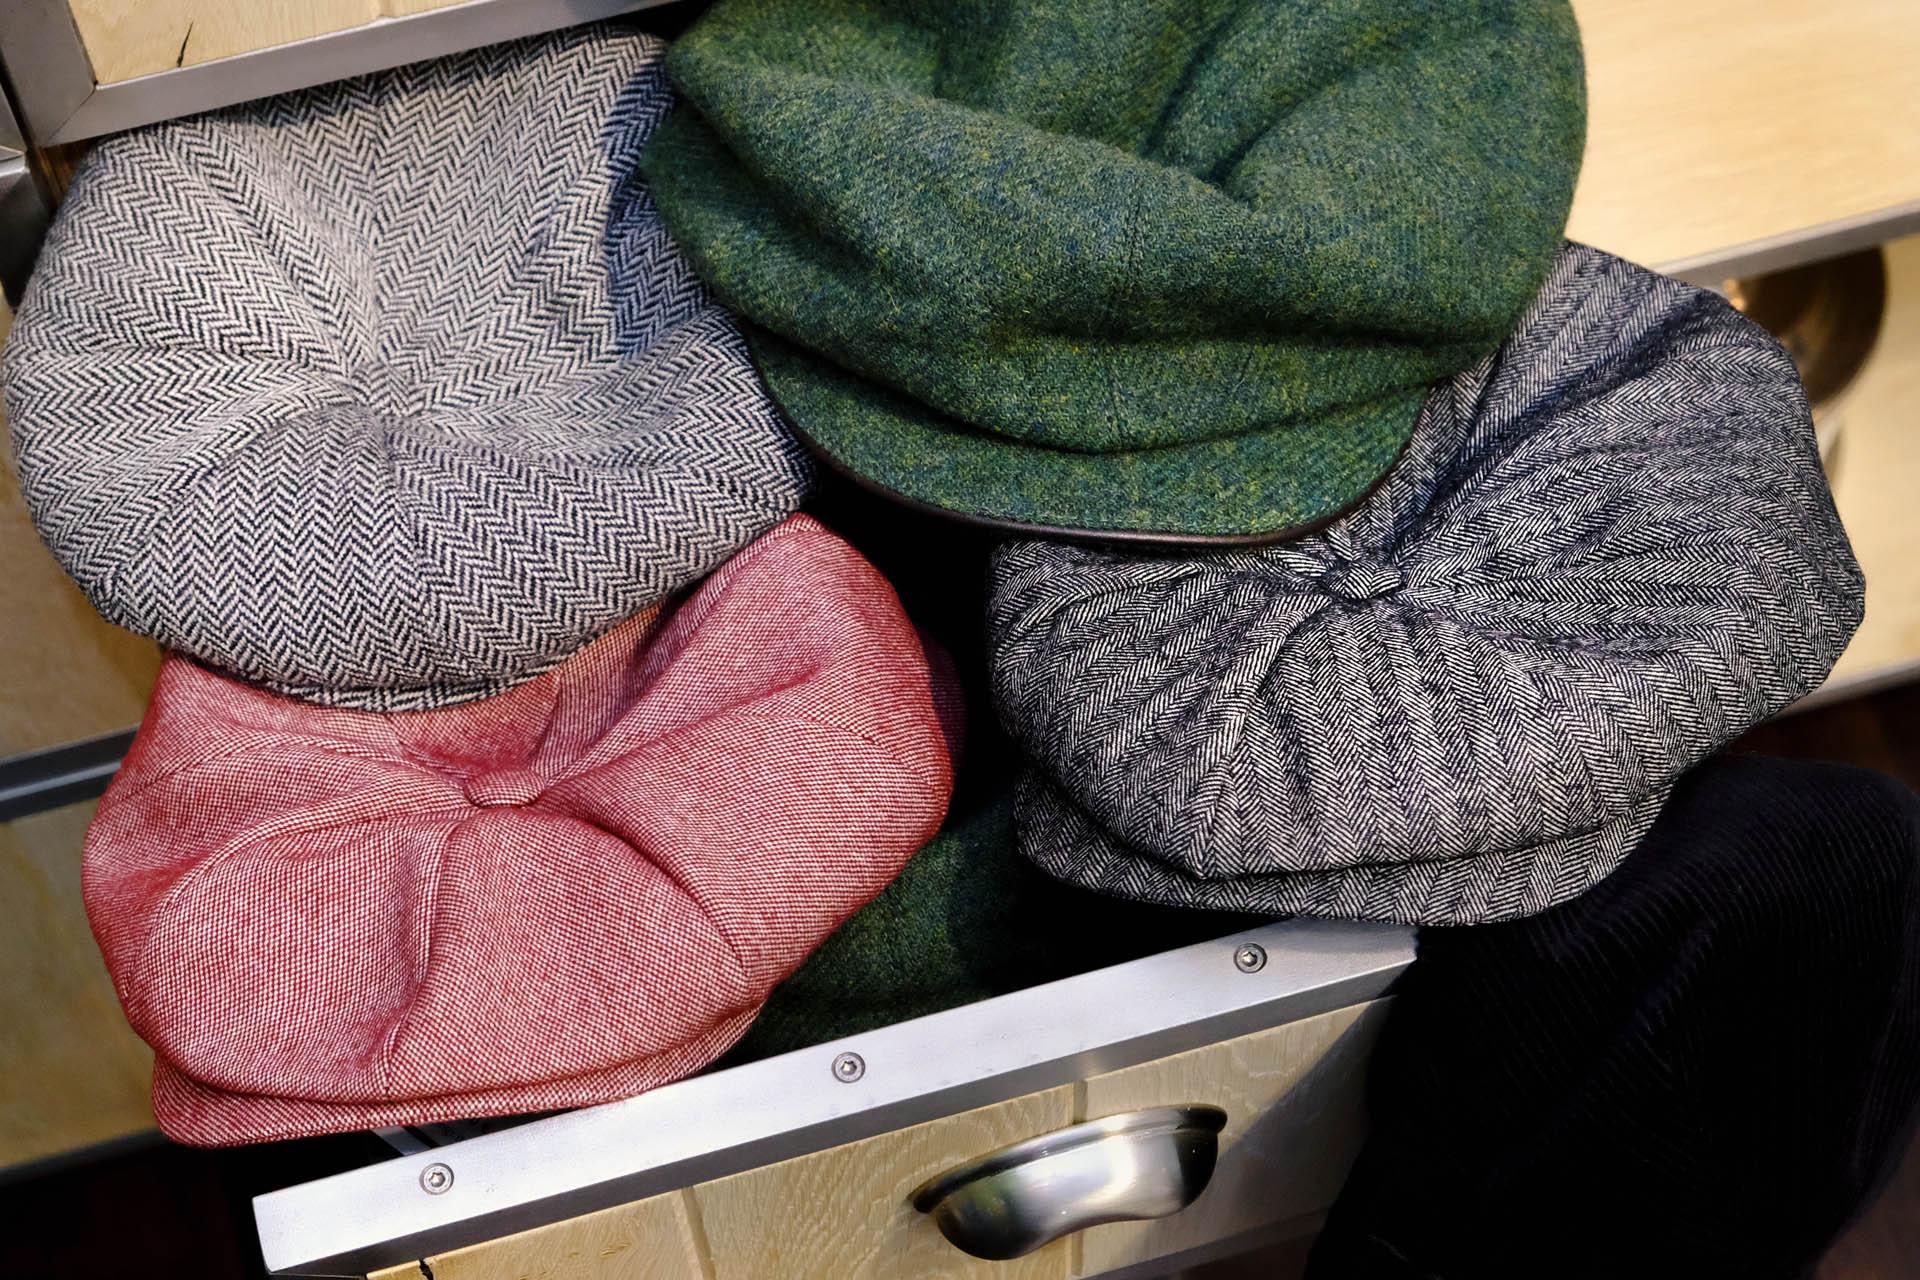 gingi-huete-muetzen-kappen-schiebermuetze-tweed-wolle-chambray-gruen-schwarz-kord-grau-rot